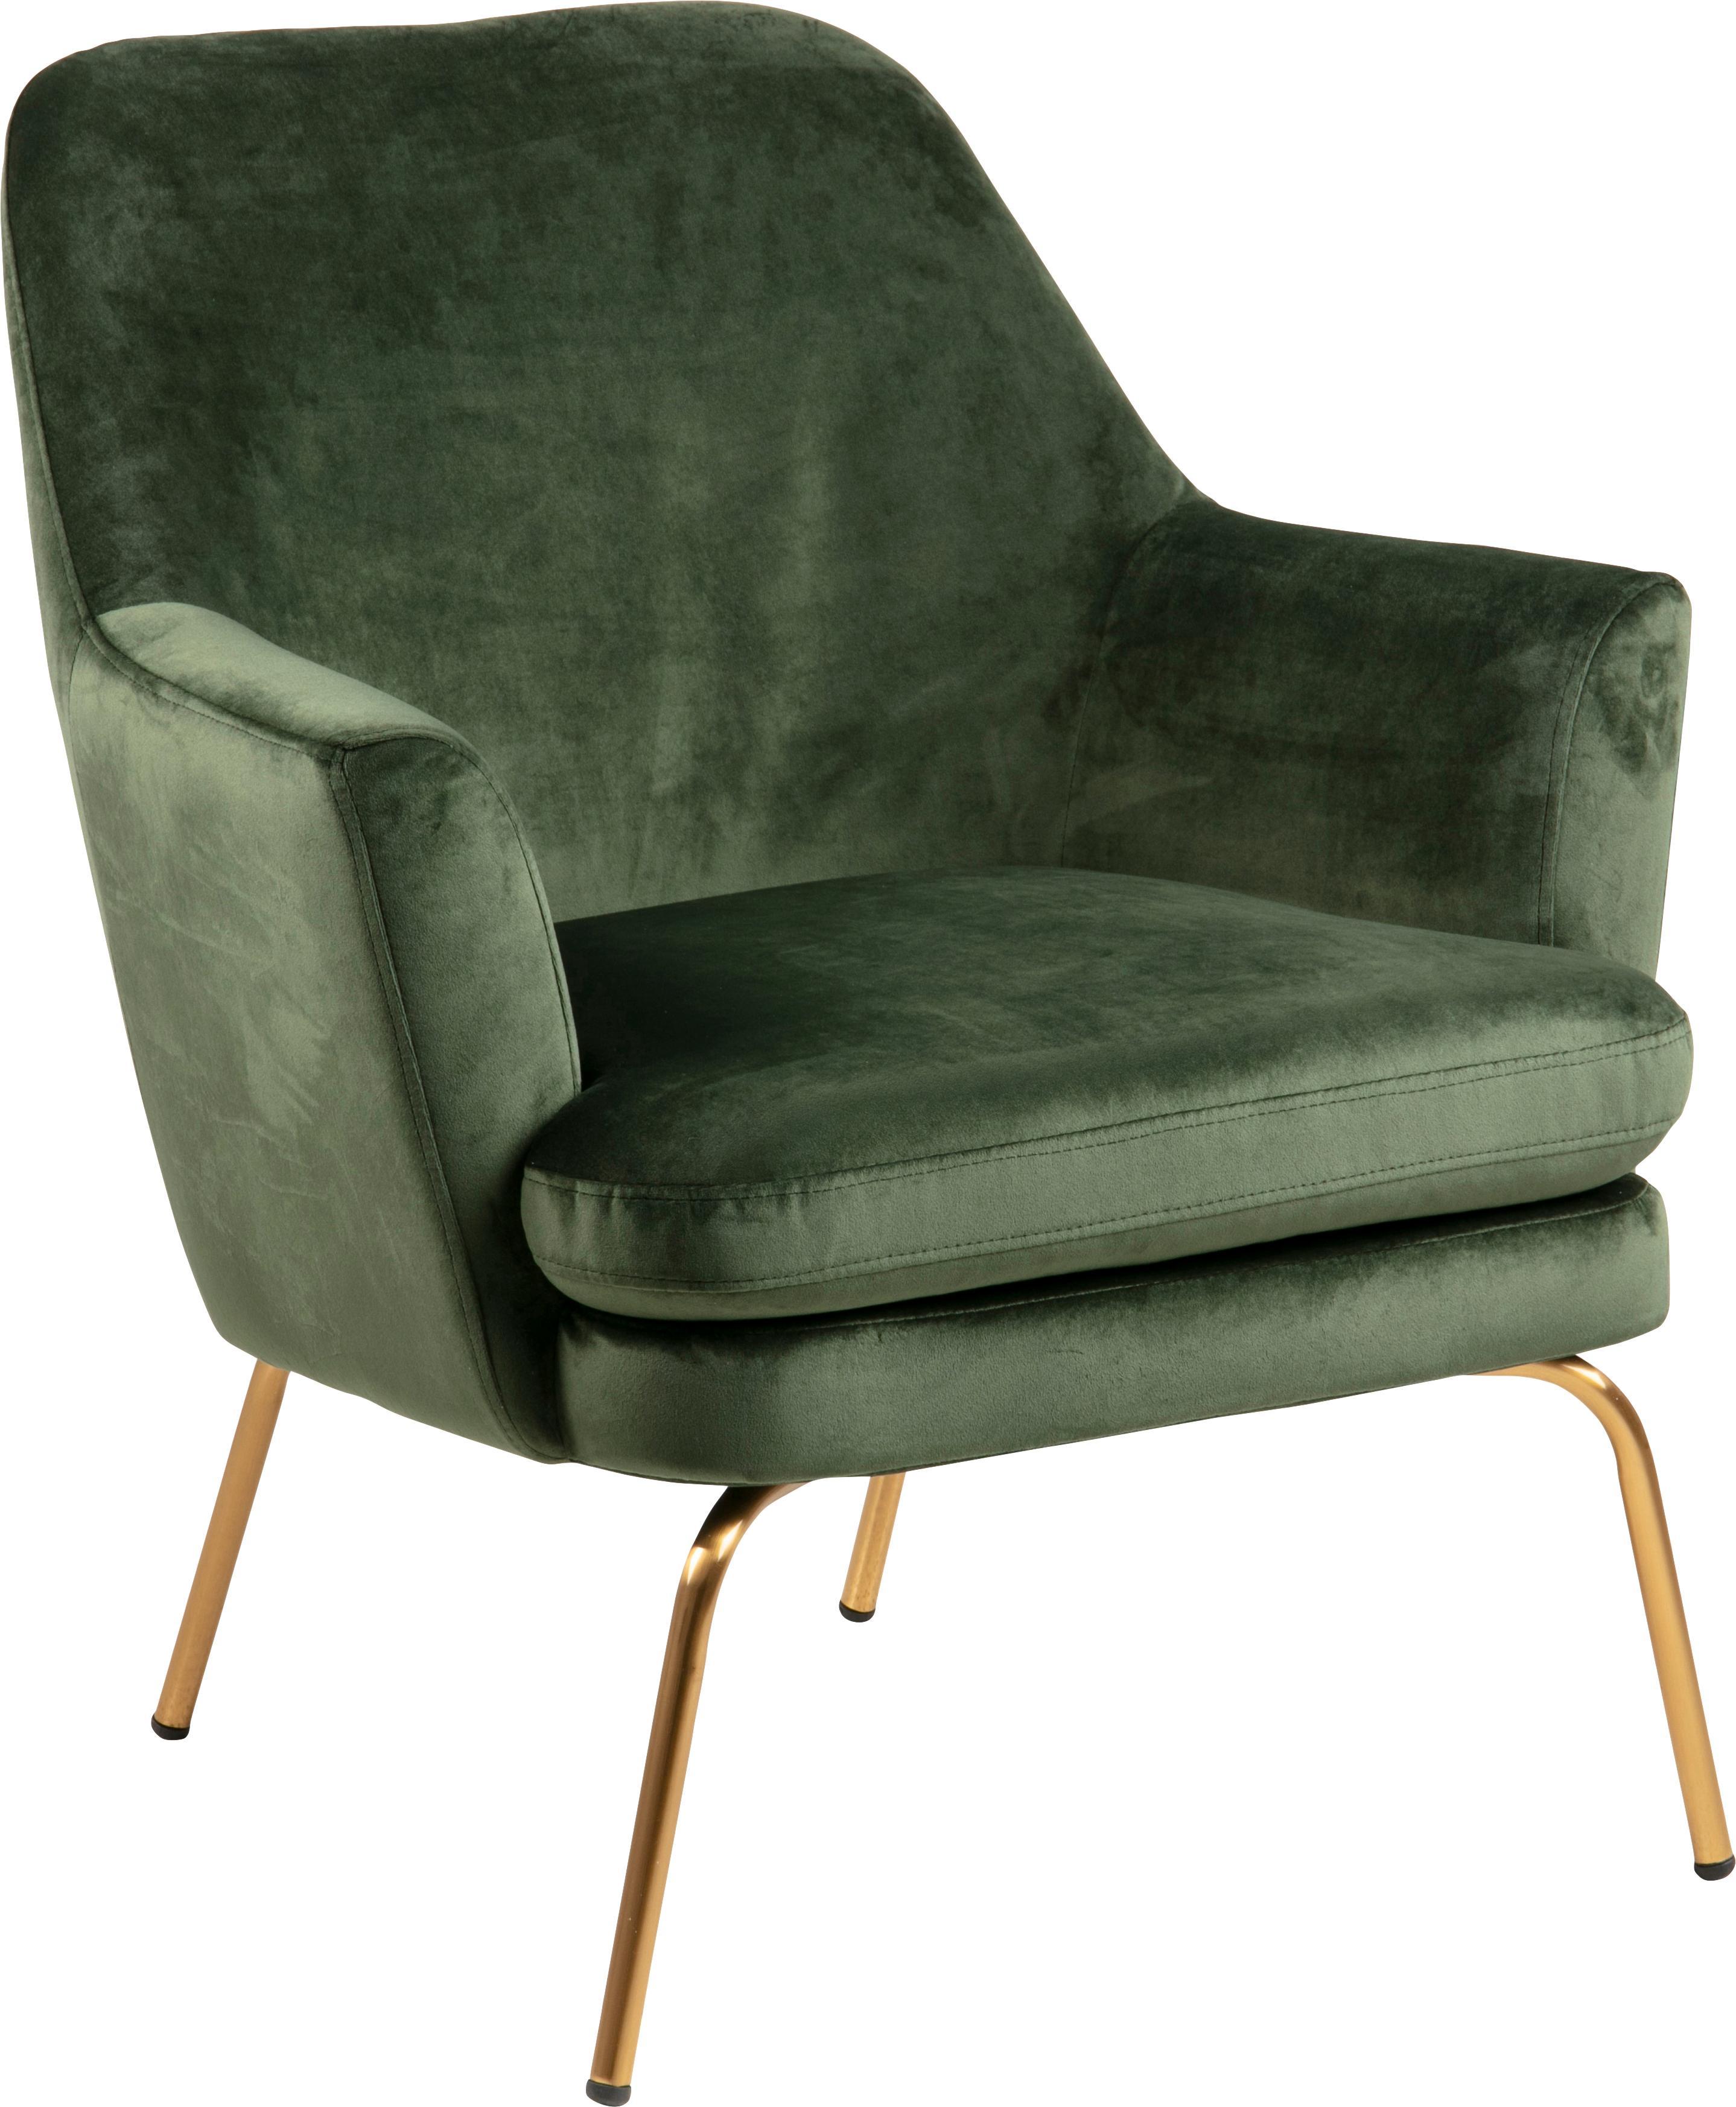 Fluwelen fauteuil Chisa, Bekleding: polyester fluweel, Poten: gelakt metaal, Fluweel bosgroen, B 74 x D 73 cm